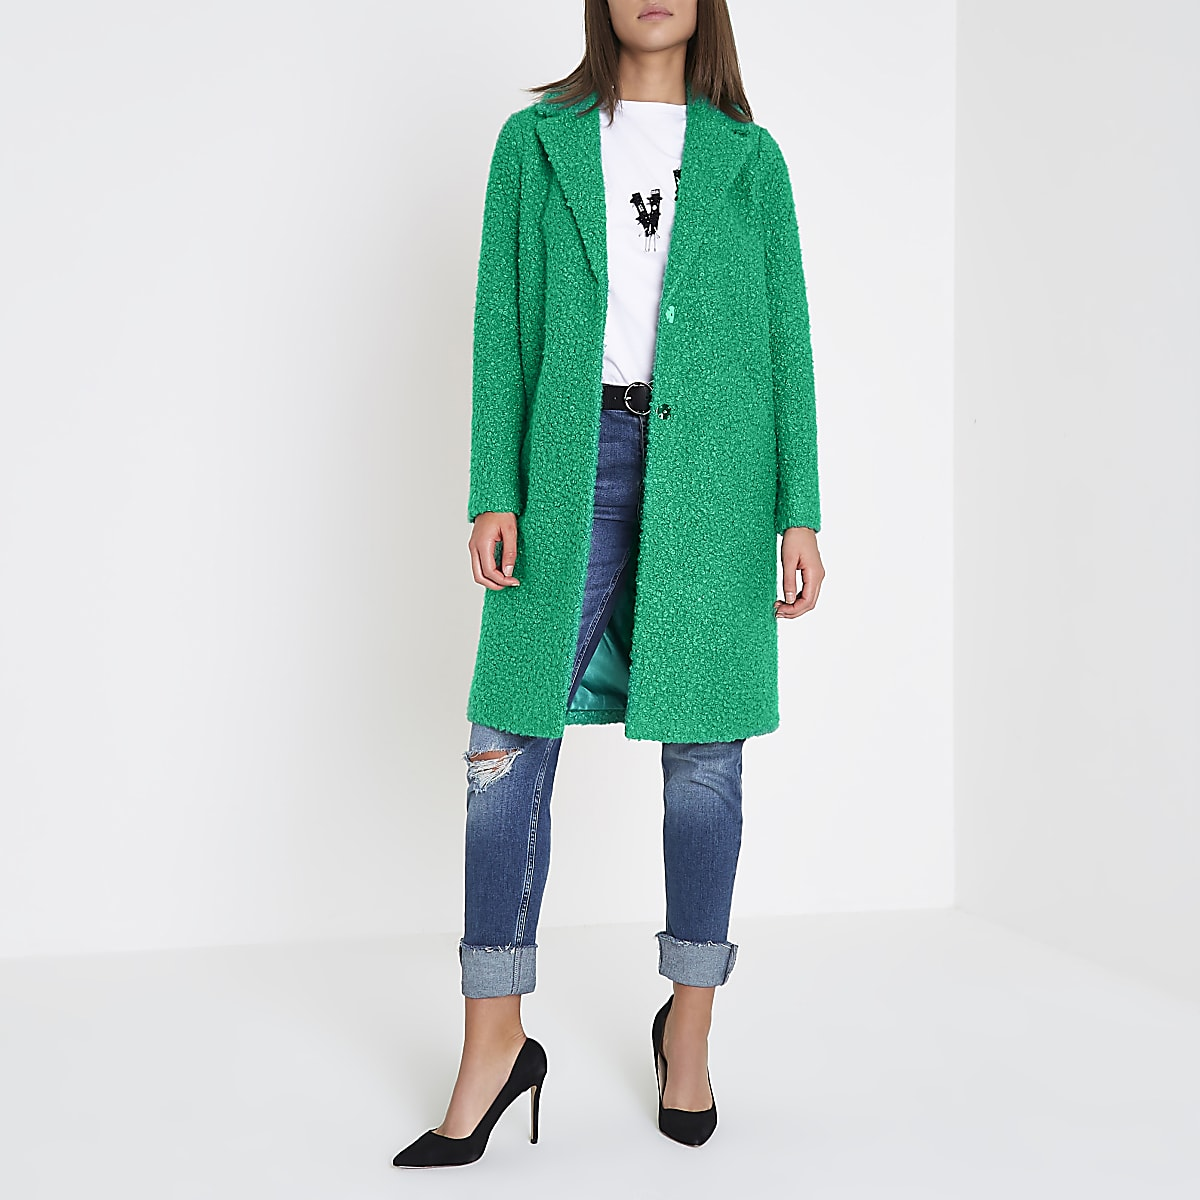 Green boucle coat